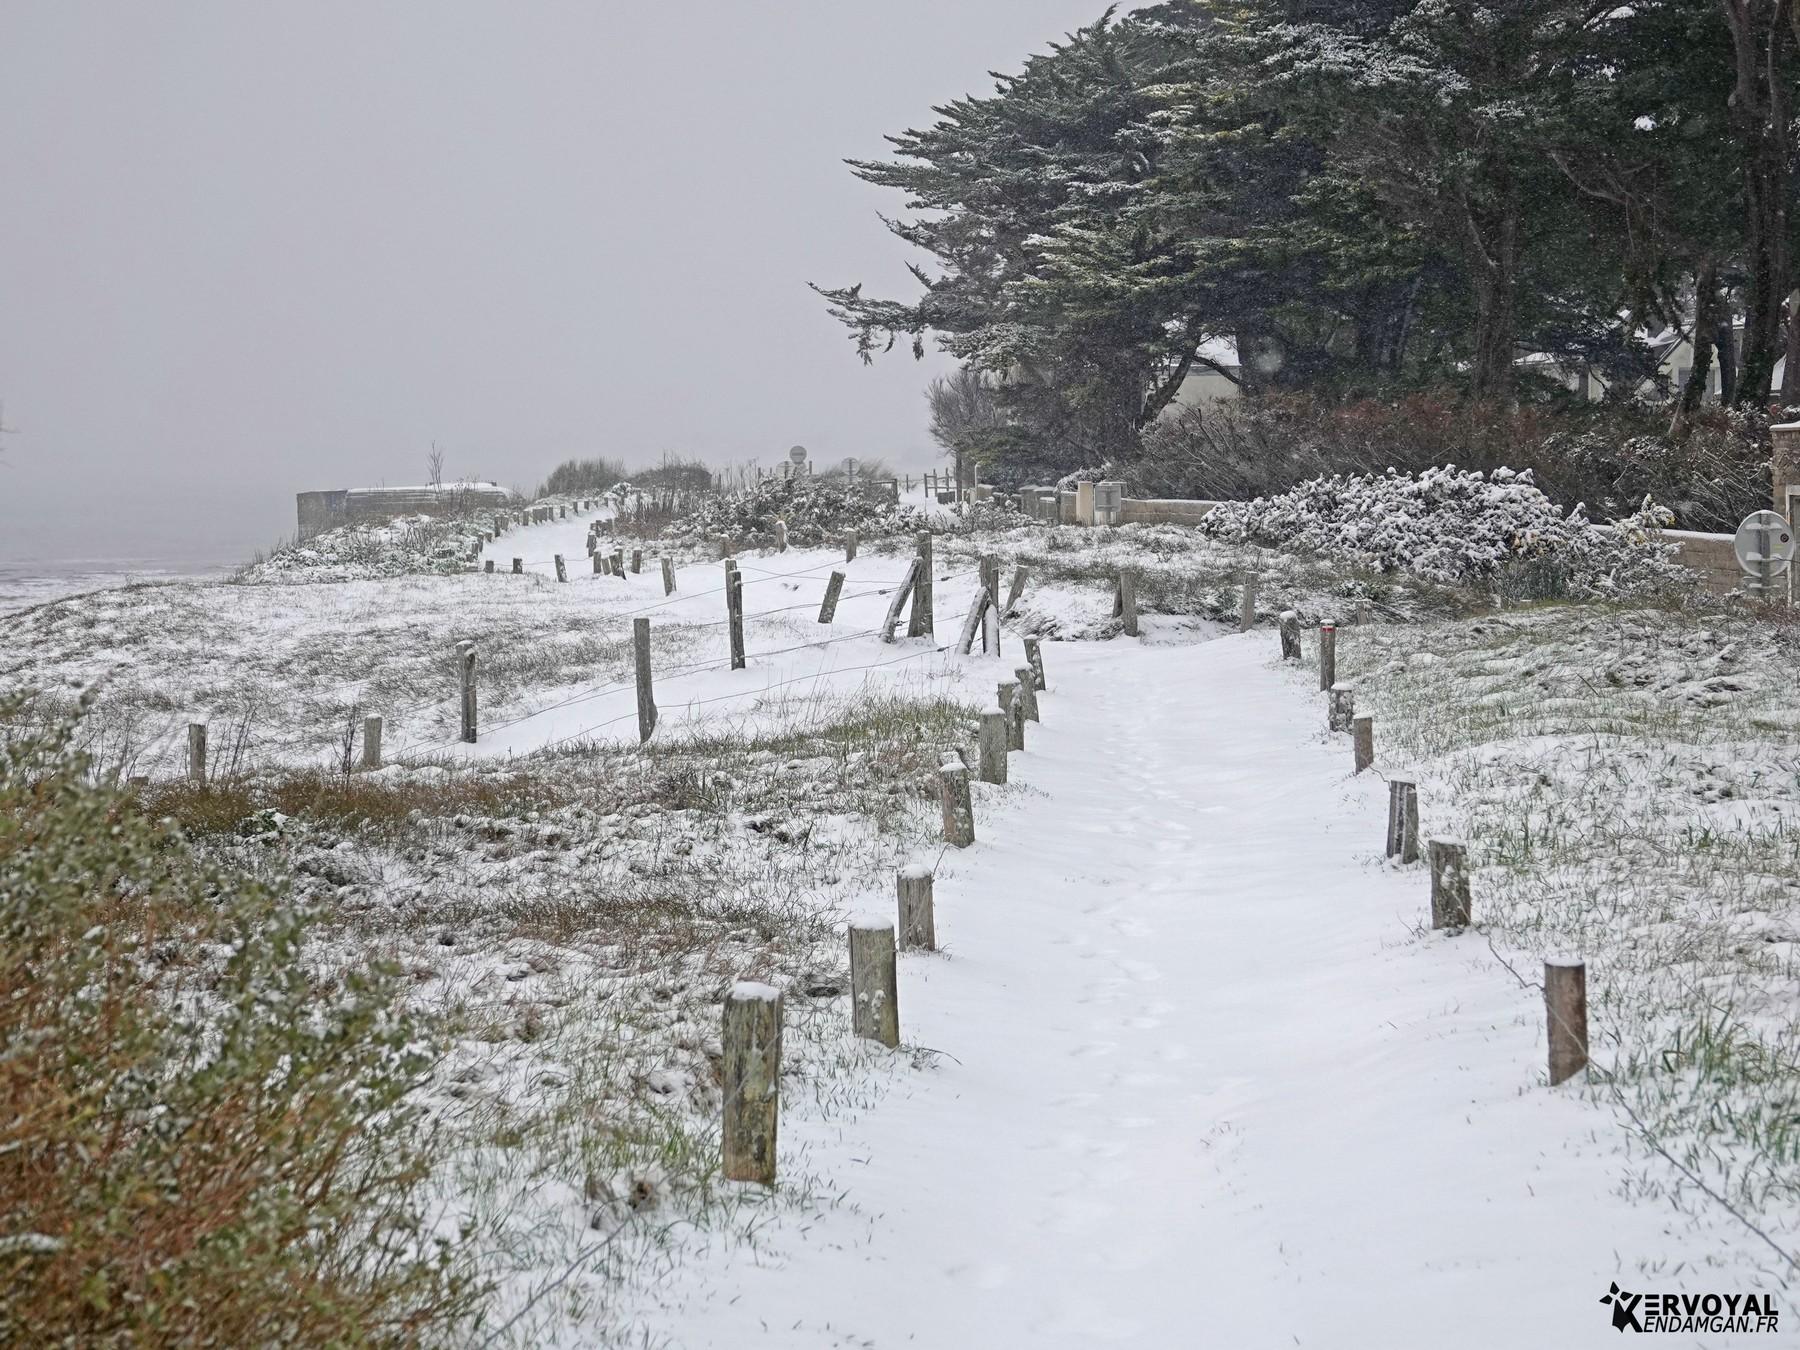 neige à kervoyal 11 février 2021 damgan morbihan (1)